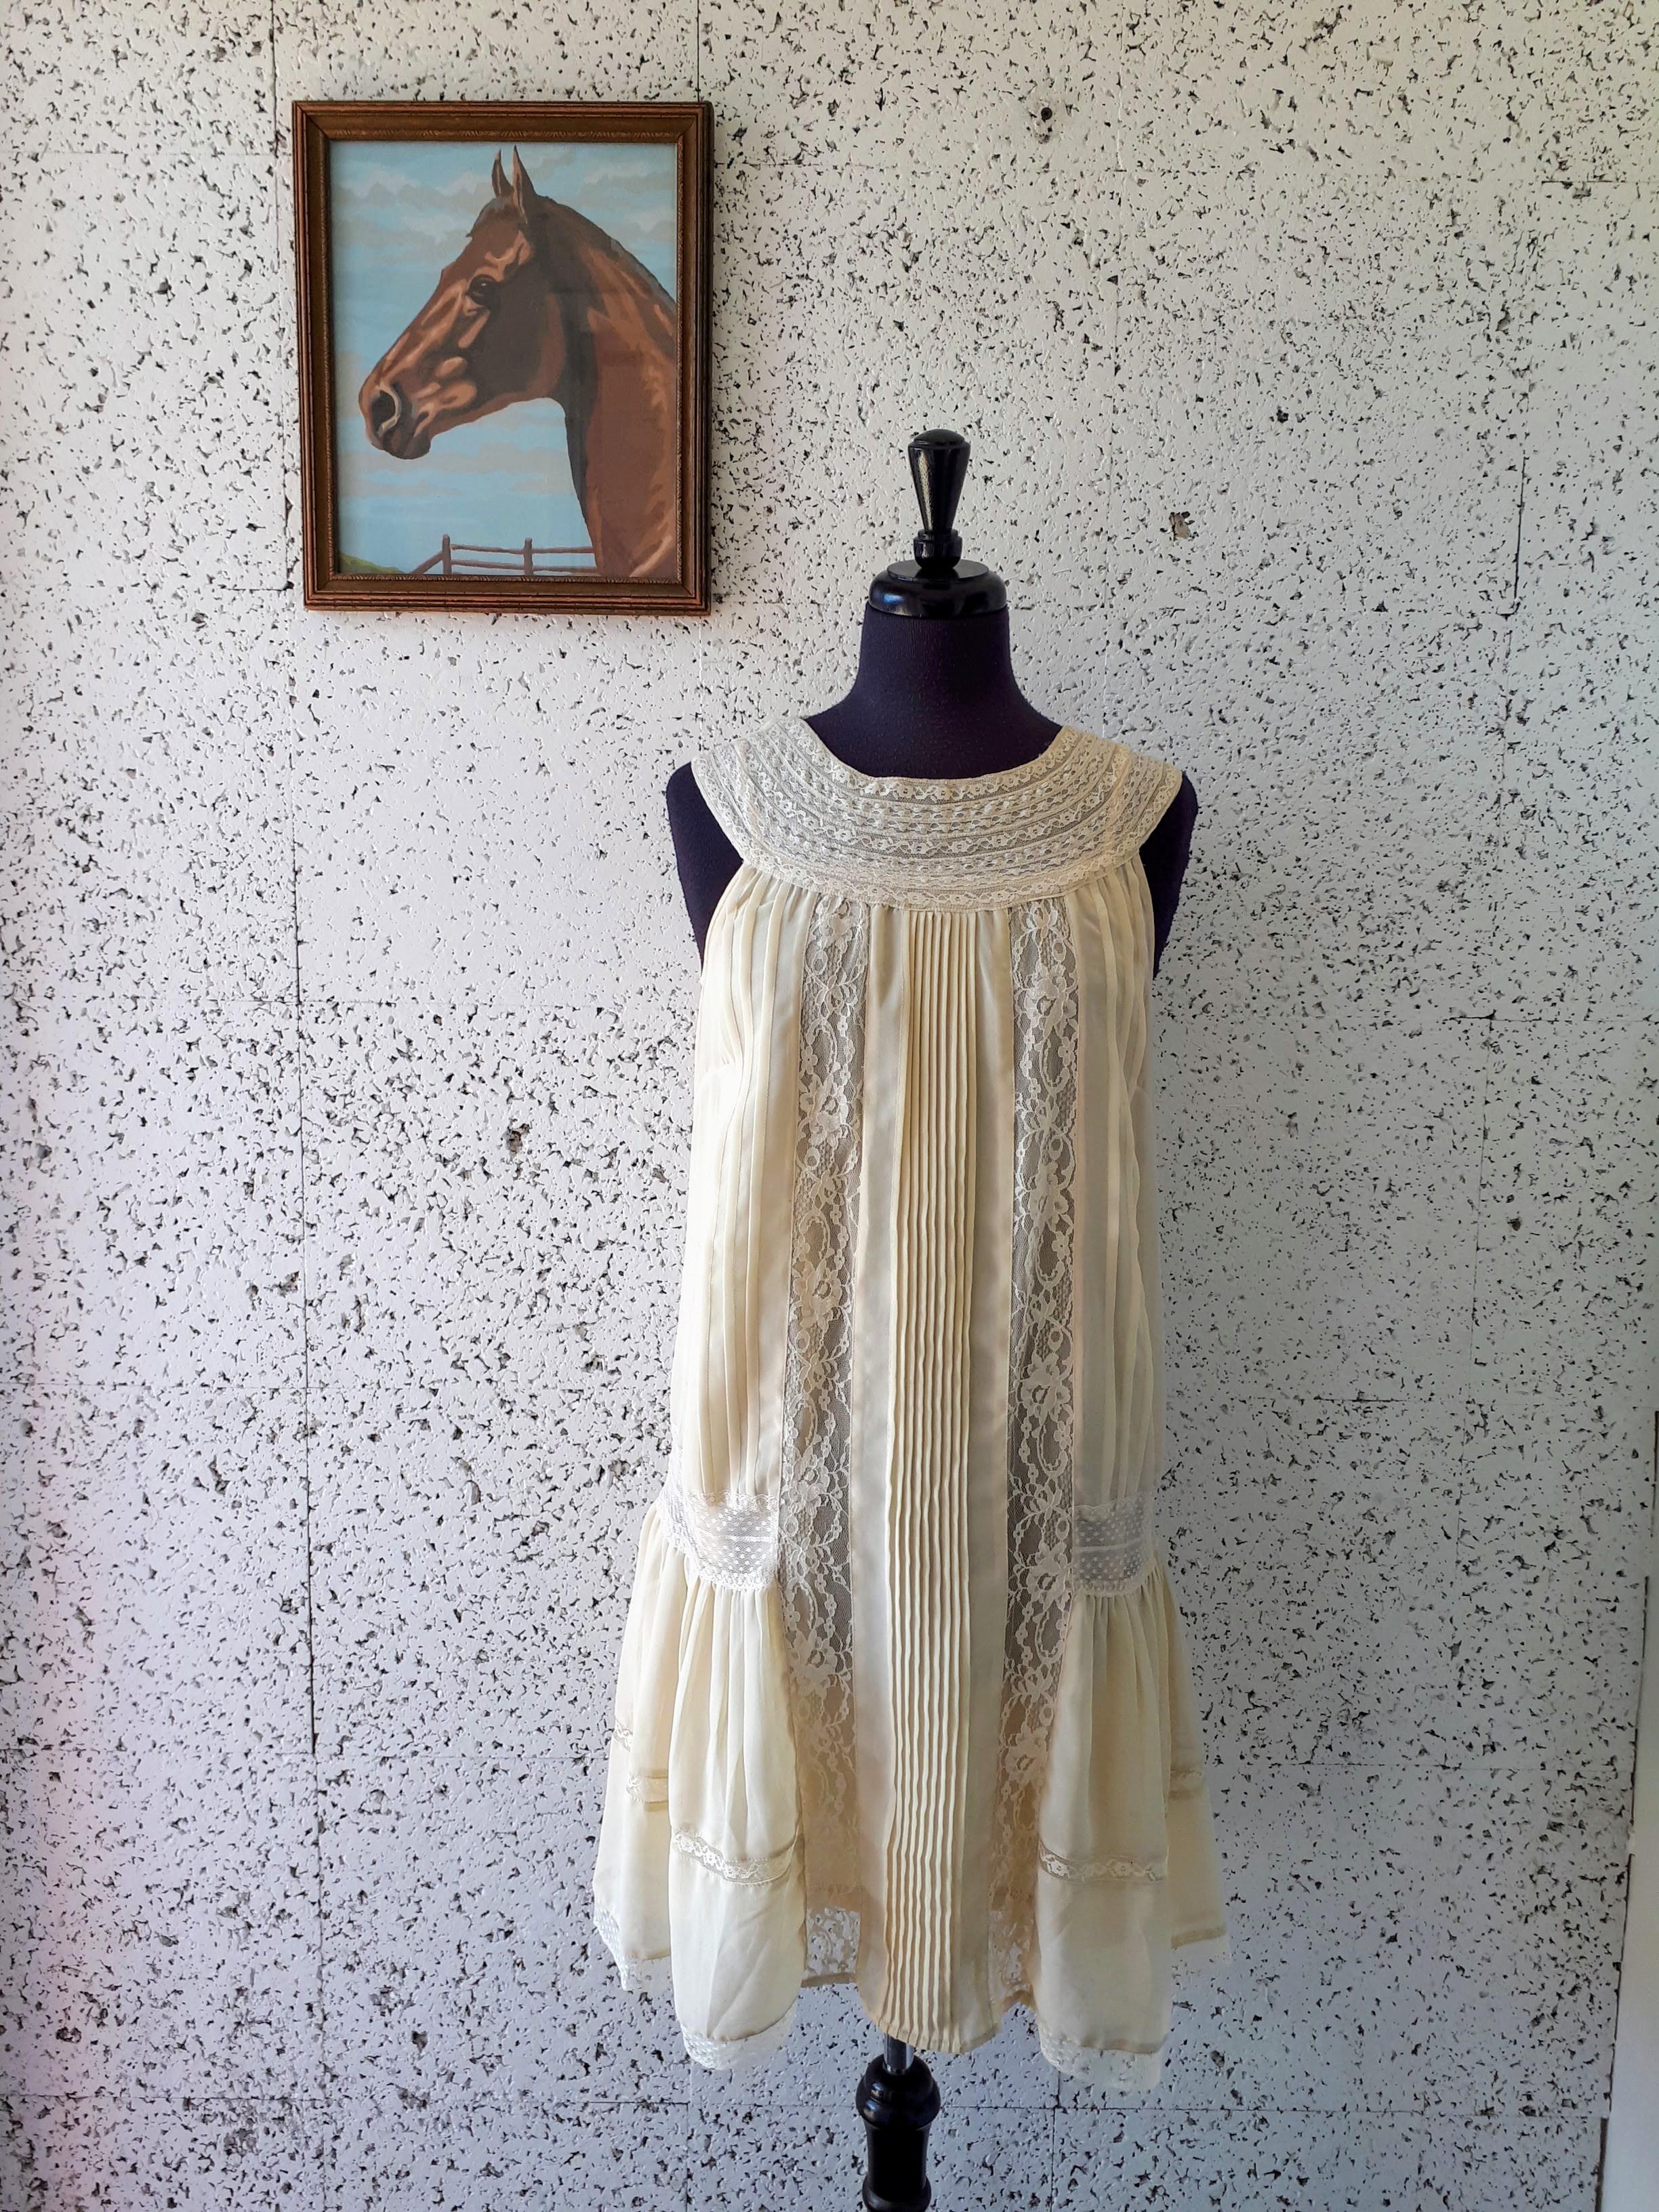 Vero Moda dress; Size M, $36